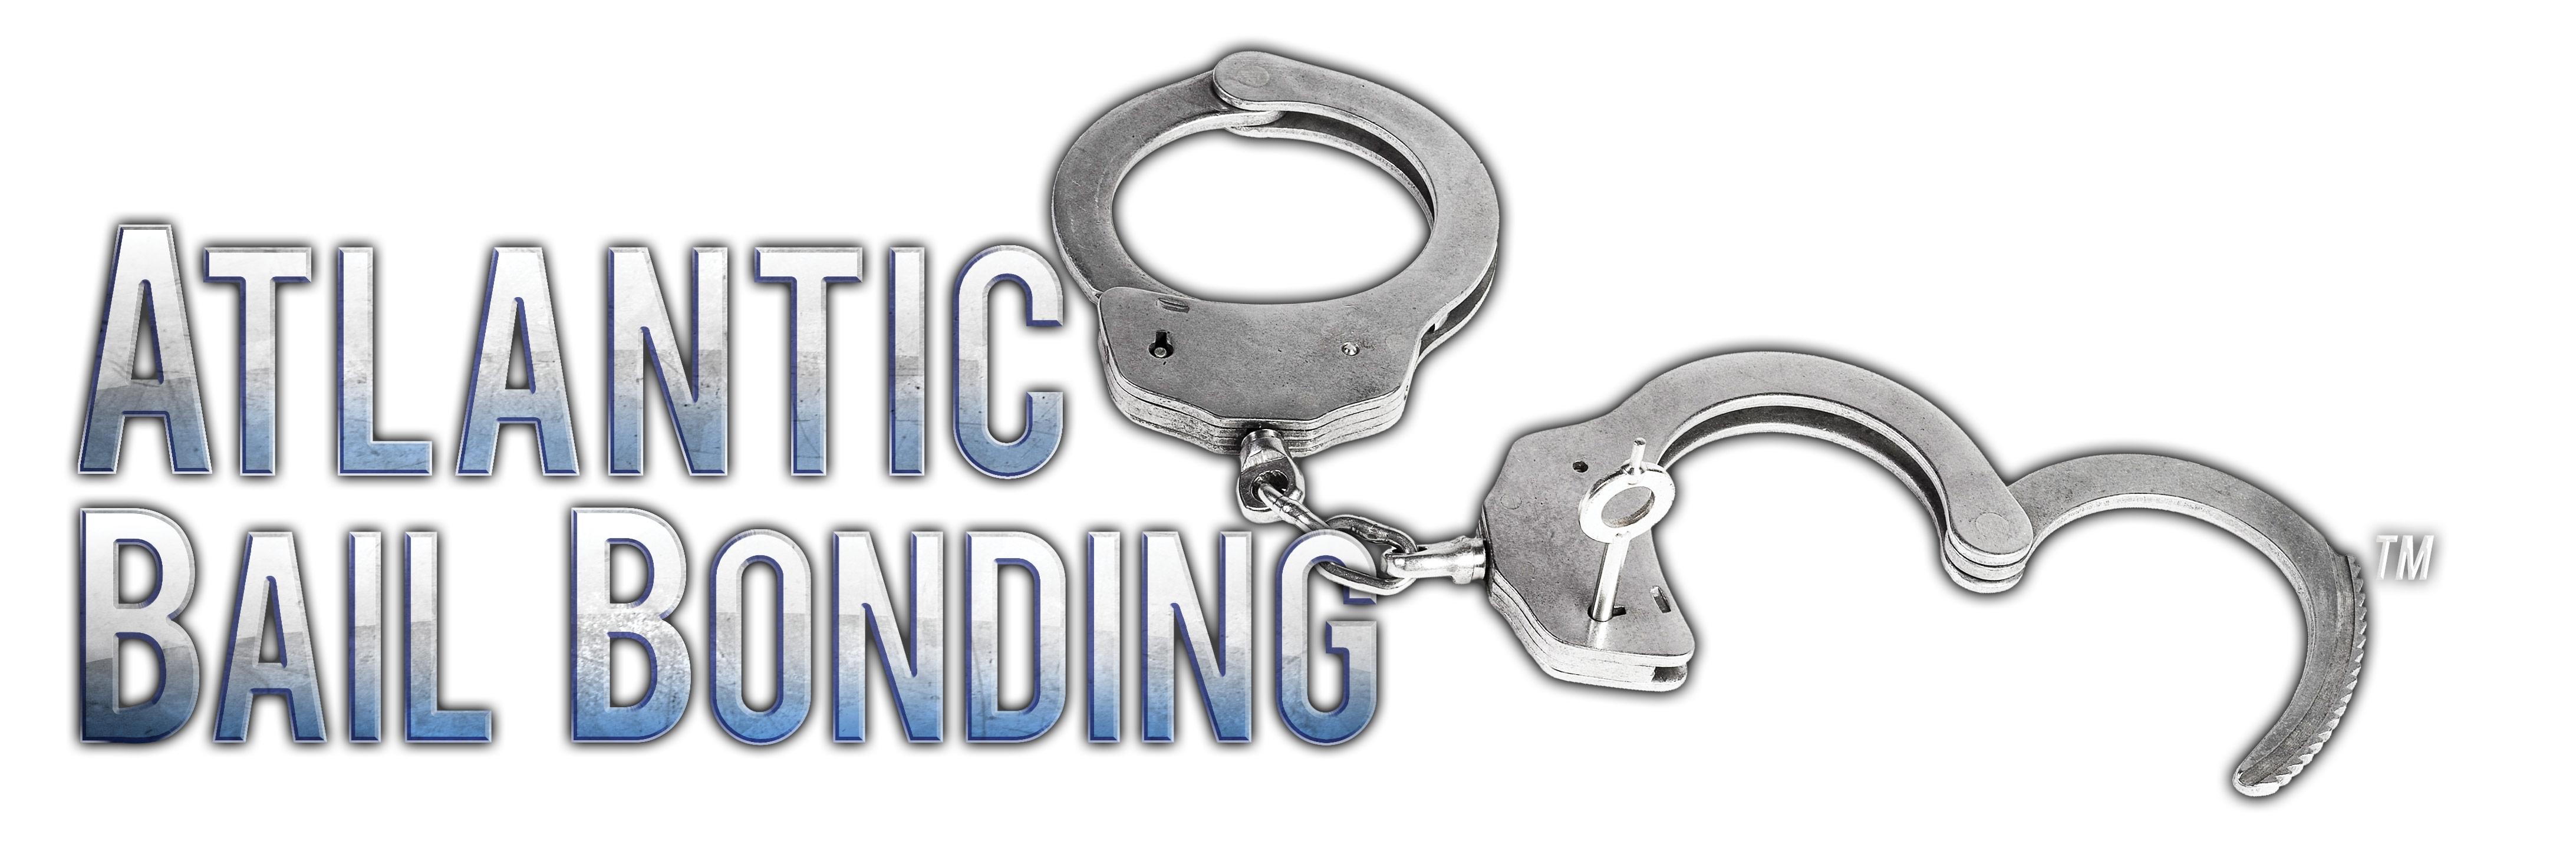 Atlantic Bail Bonding LLC